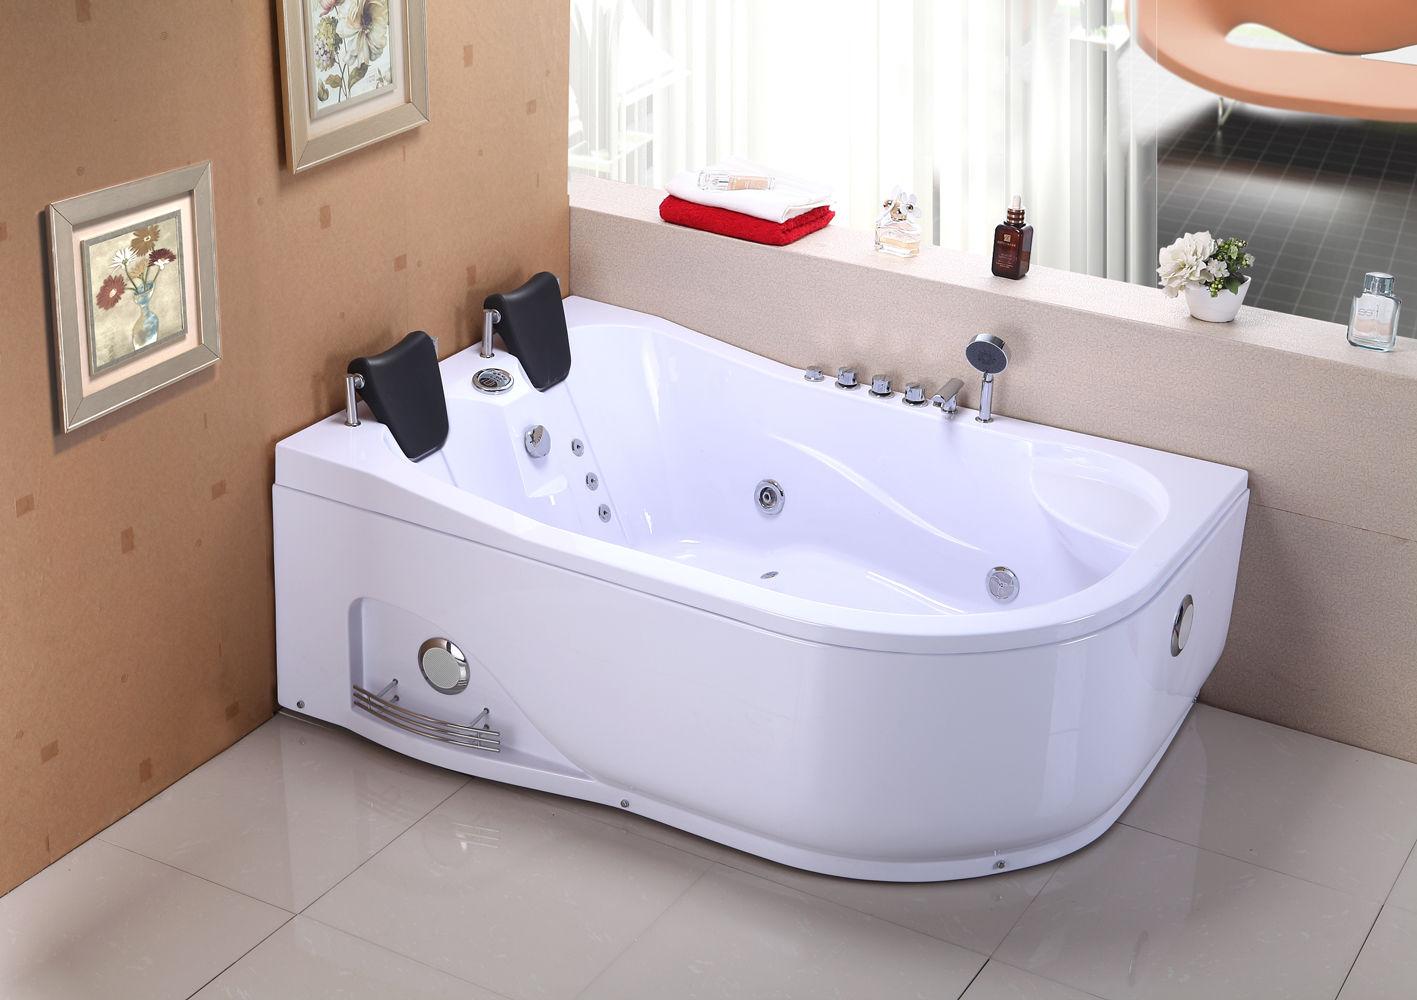 Vasca Da Bagno Doppia Misure : Vasca idromassaggio con doccia prezzi